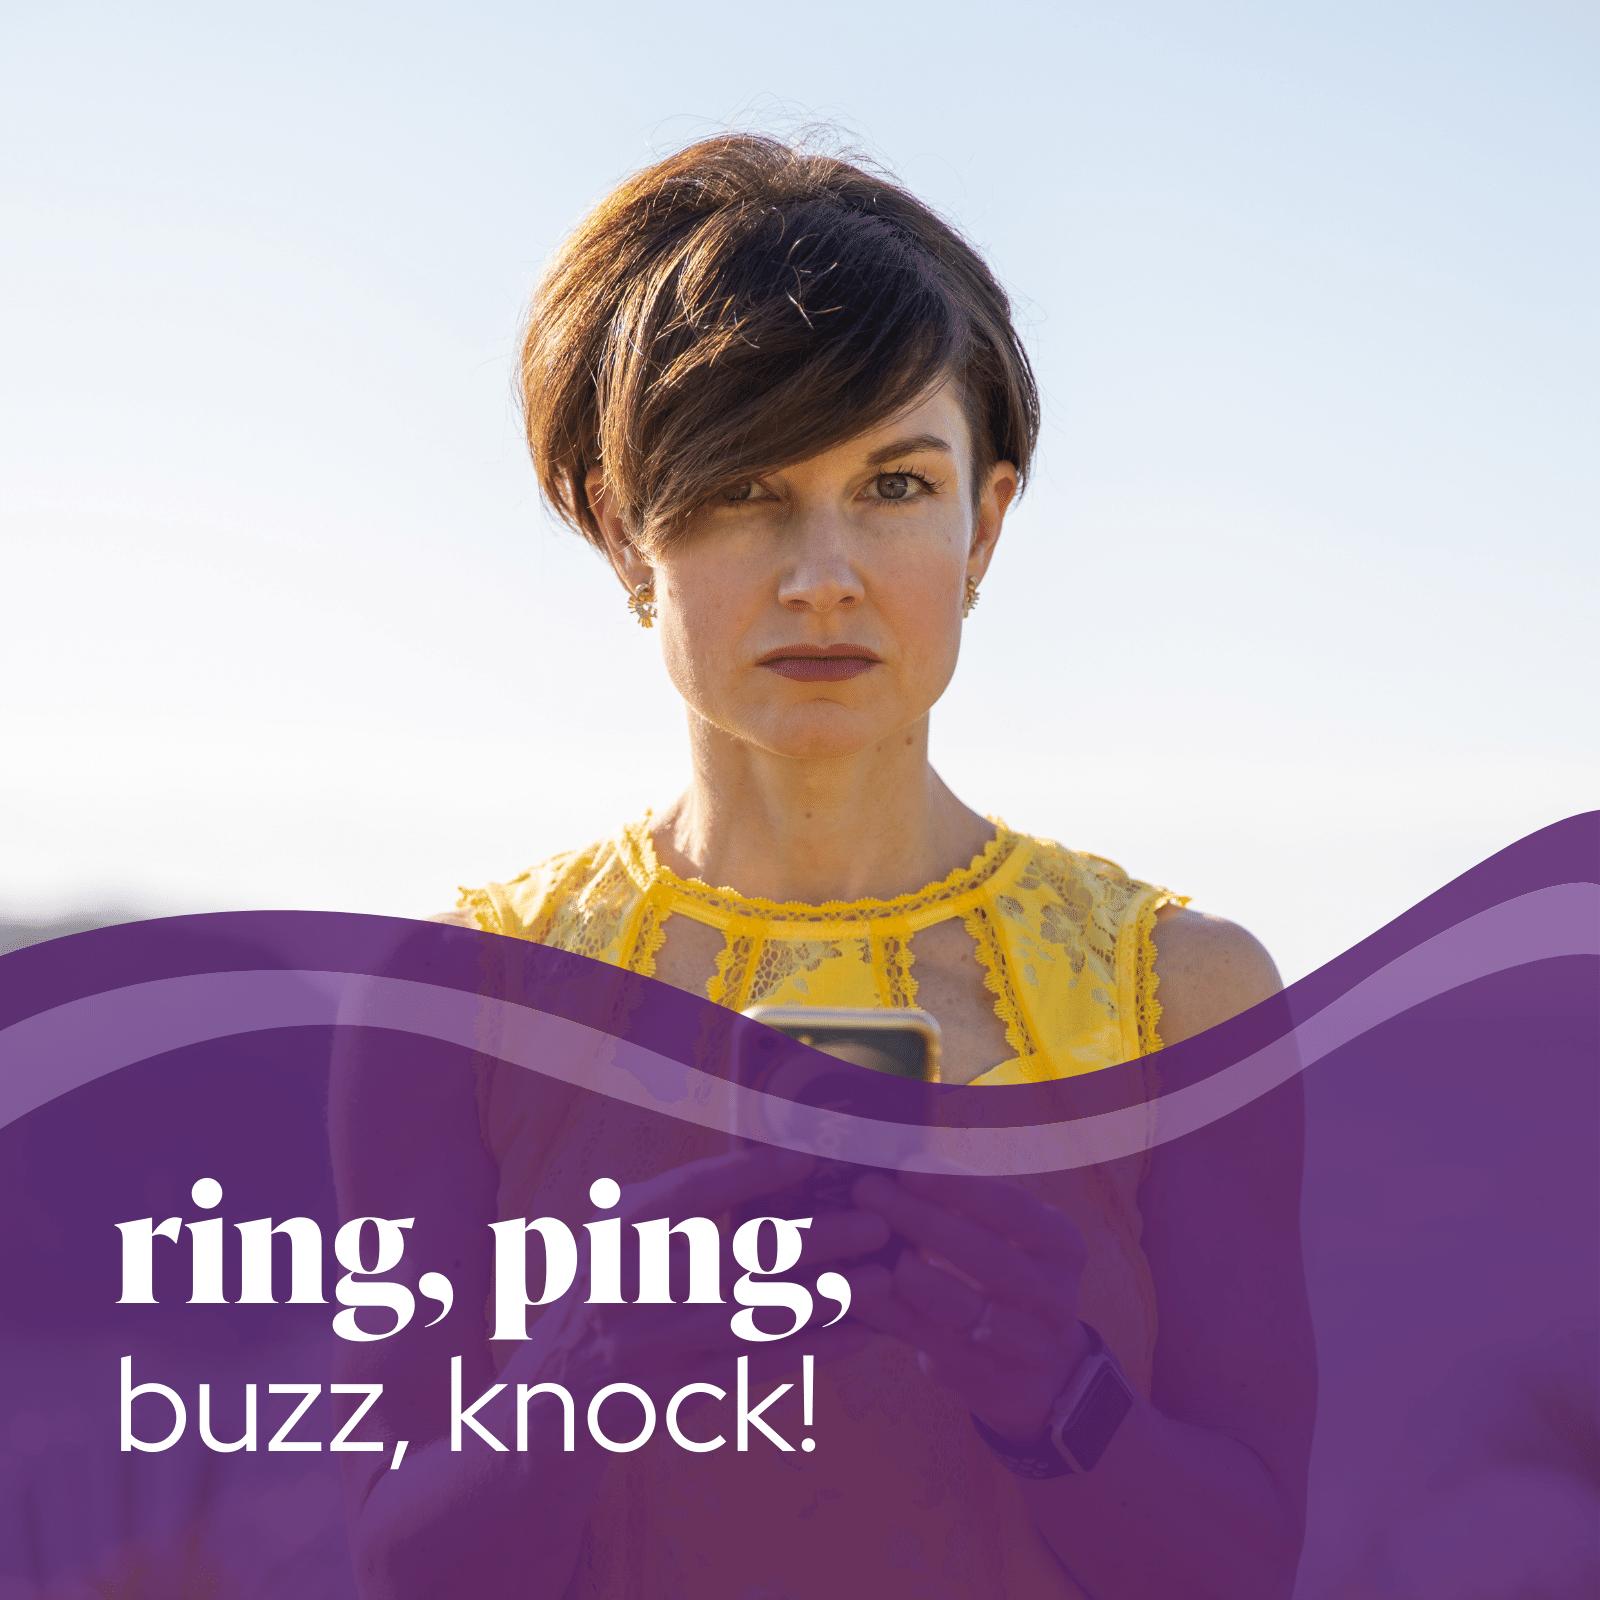 ring, ping, buzz, knock!